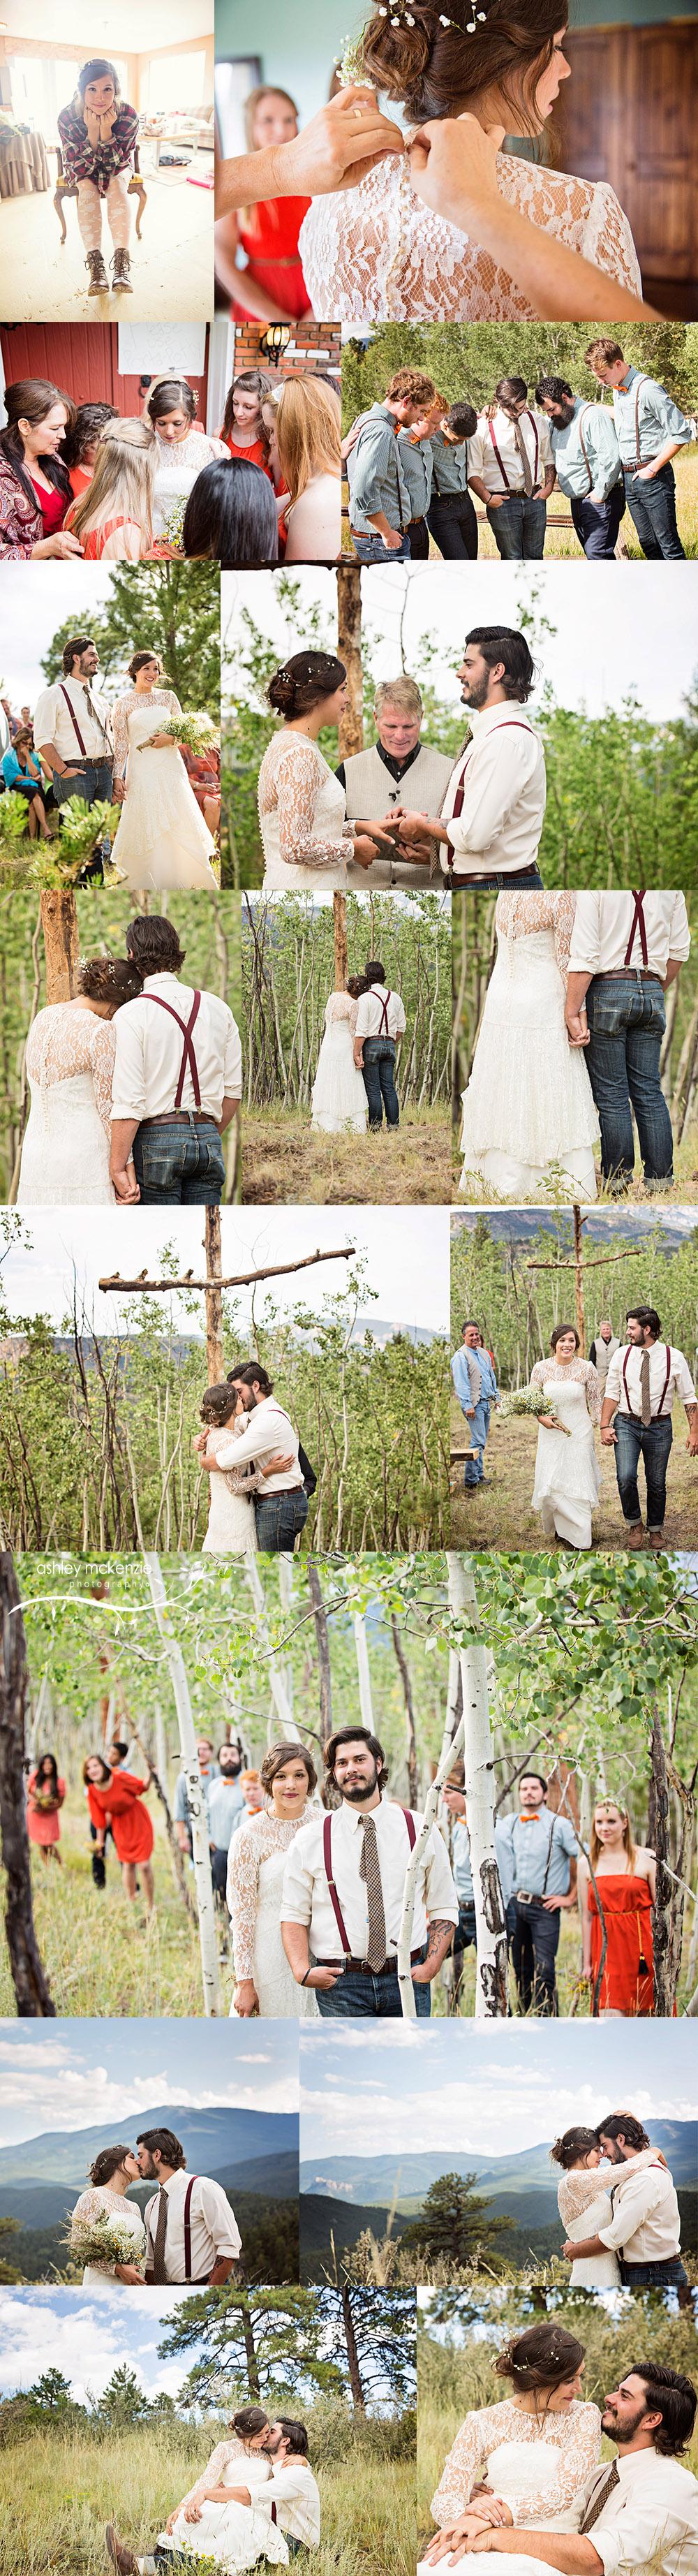 Wedding Photography by Ashley McKenzie Photography in Bailey, Colorado